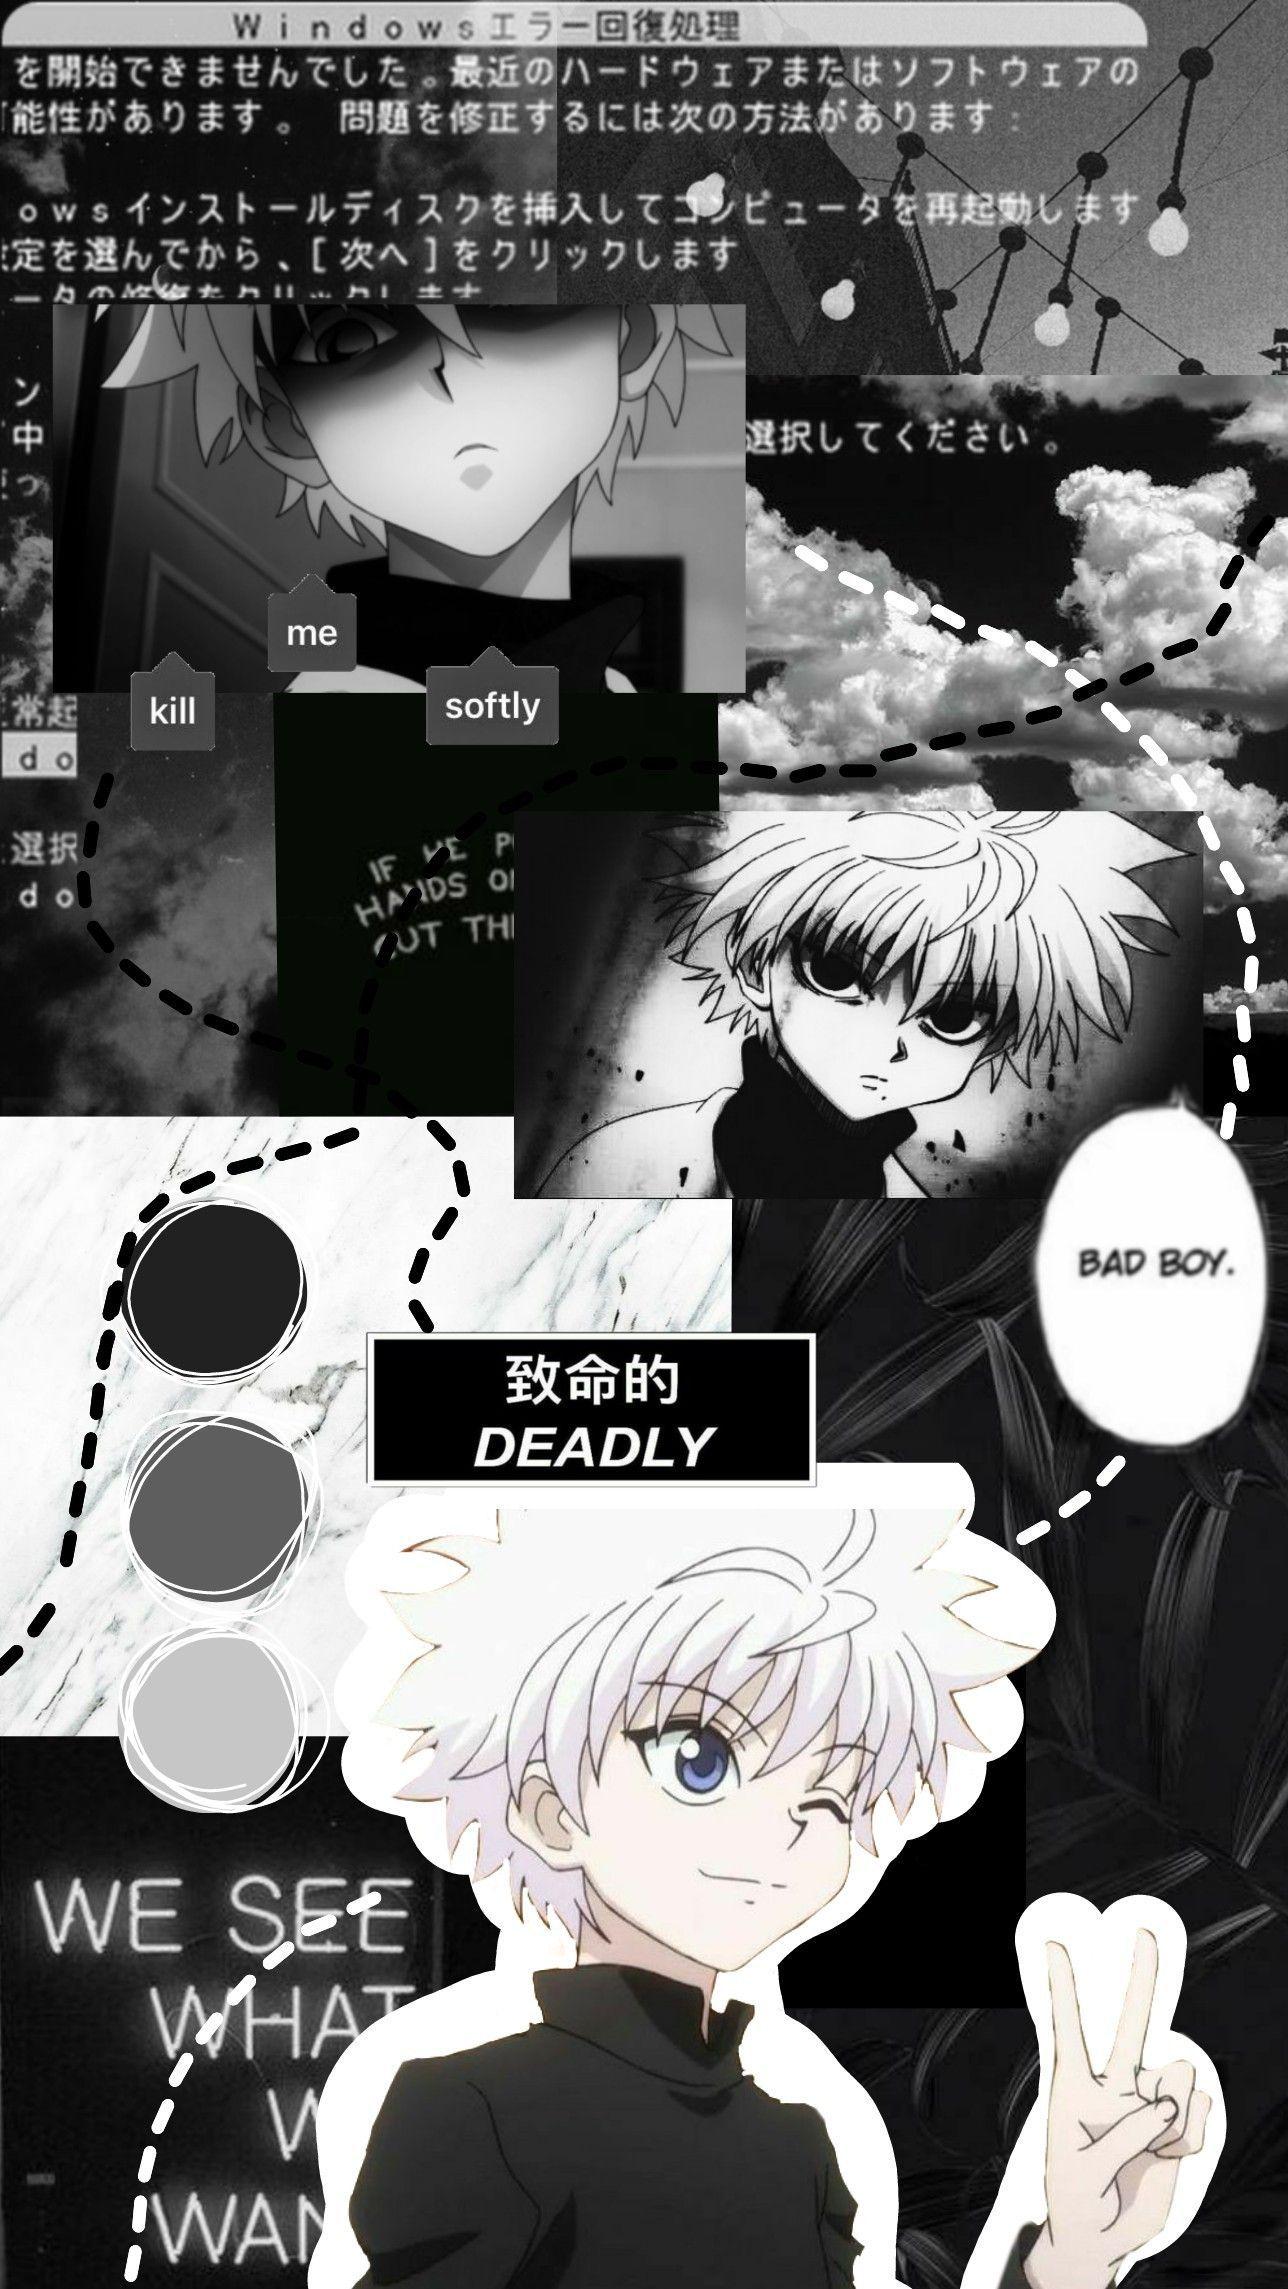 Pin On Gacha Anime Wallpaper Anime Wallpaper Iphone Aesthetic Anime